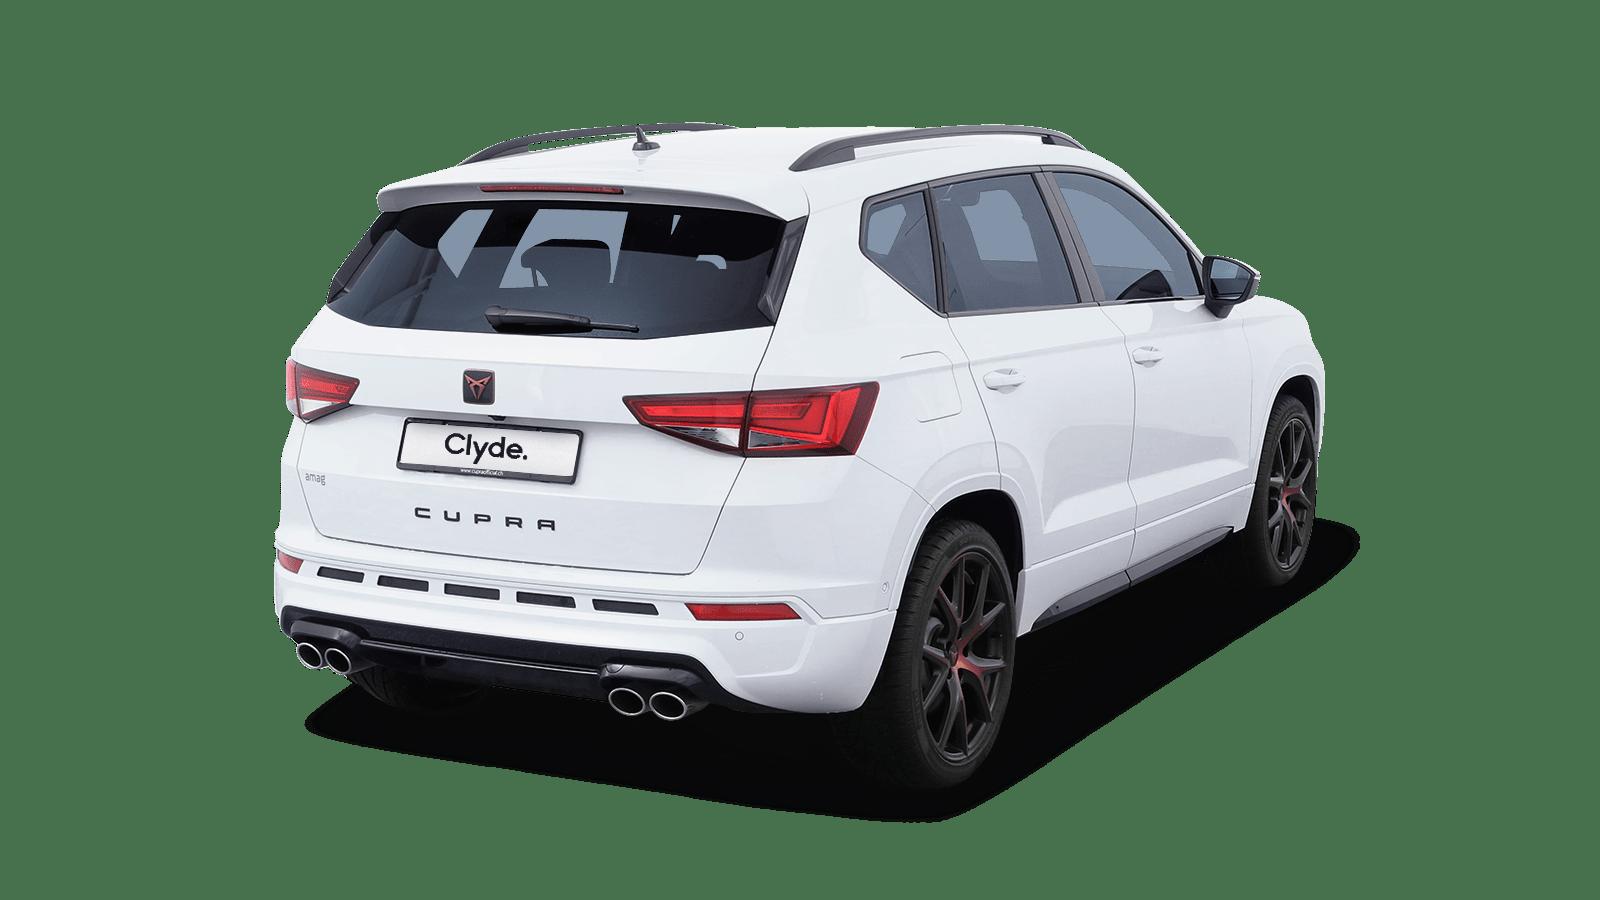 VW Golf Silver back - Clyde car subscription